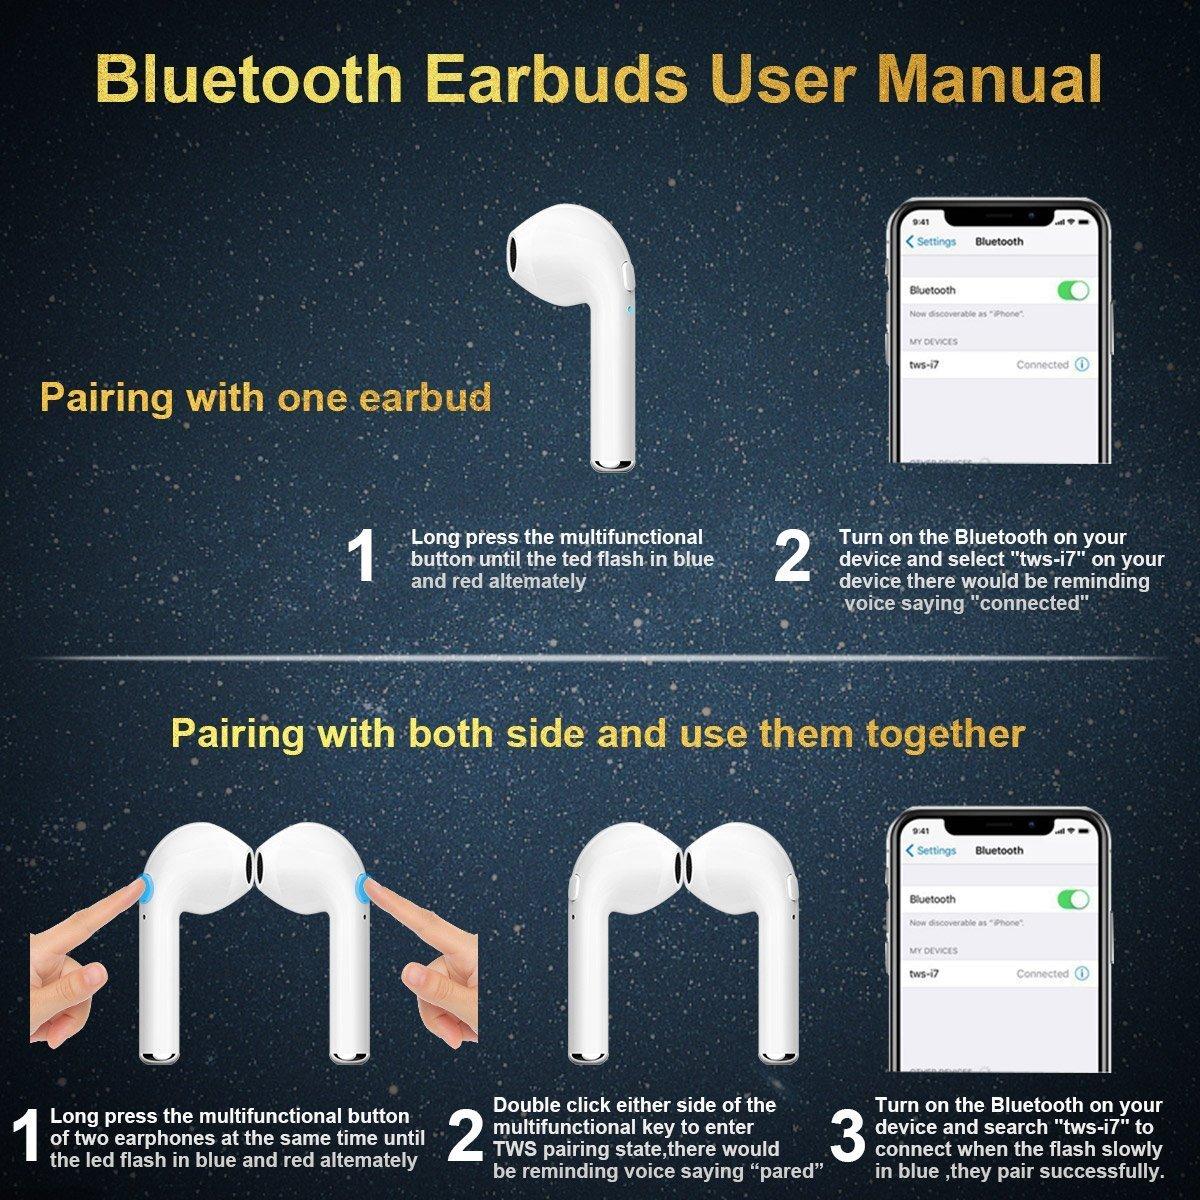 Bluetooth Earbud Wireless Earbuds Built-in Mic In-Ear Earbud Earphones Sports Cordless Bluetooth Headphones Stereo Bass Earpiece Wireless Bluetooth Earbuds Suitable all smartphones